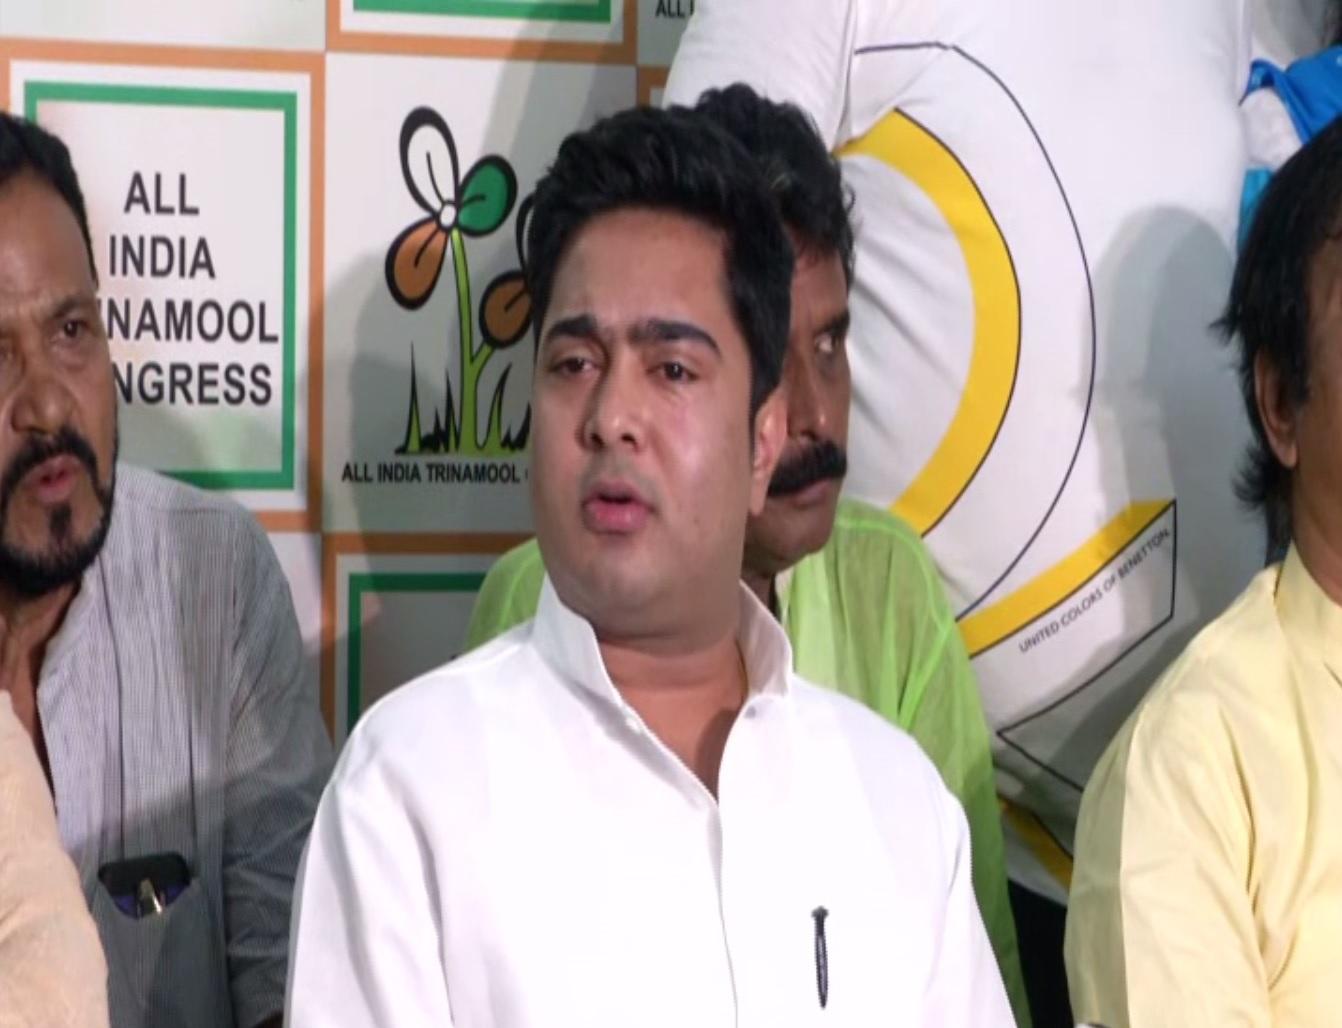 Abhiskeh Banerjee holding a press conference in Kolkata on Saturday. Photo/ANI